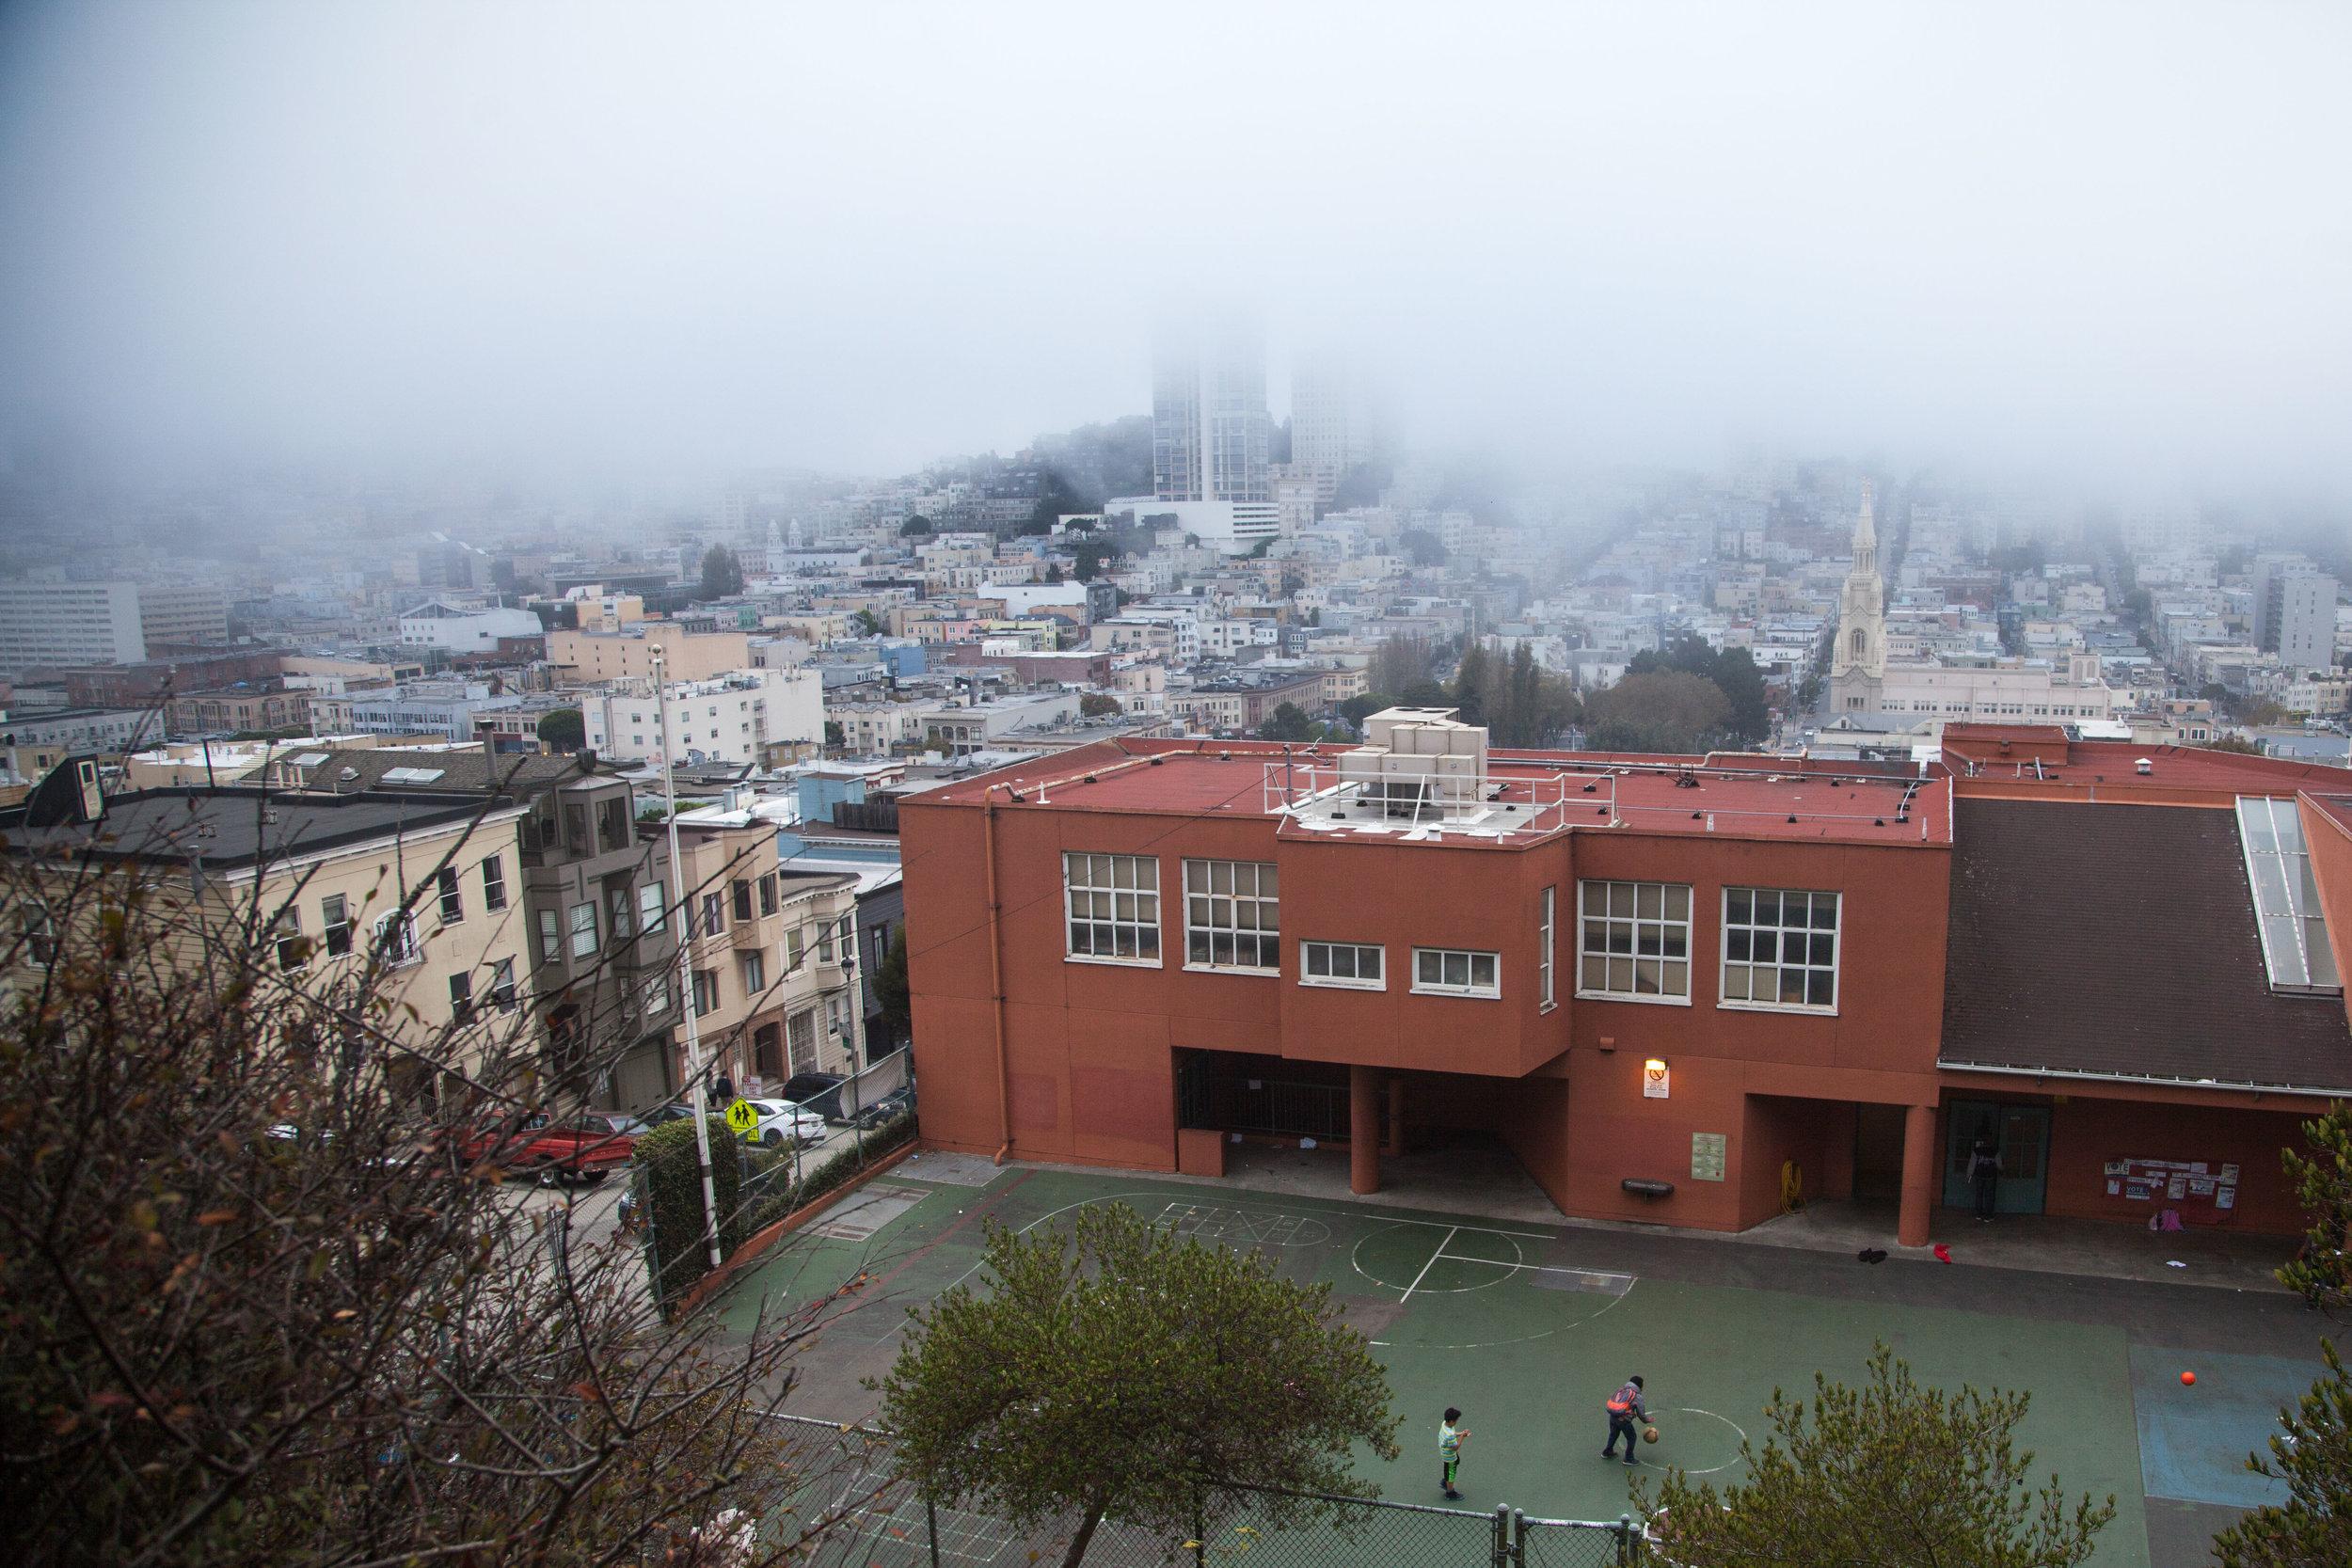 Kids playing basketball San Francisco Voyage Collective Rory Armstrong